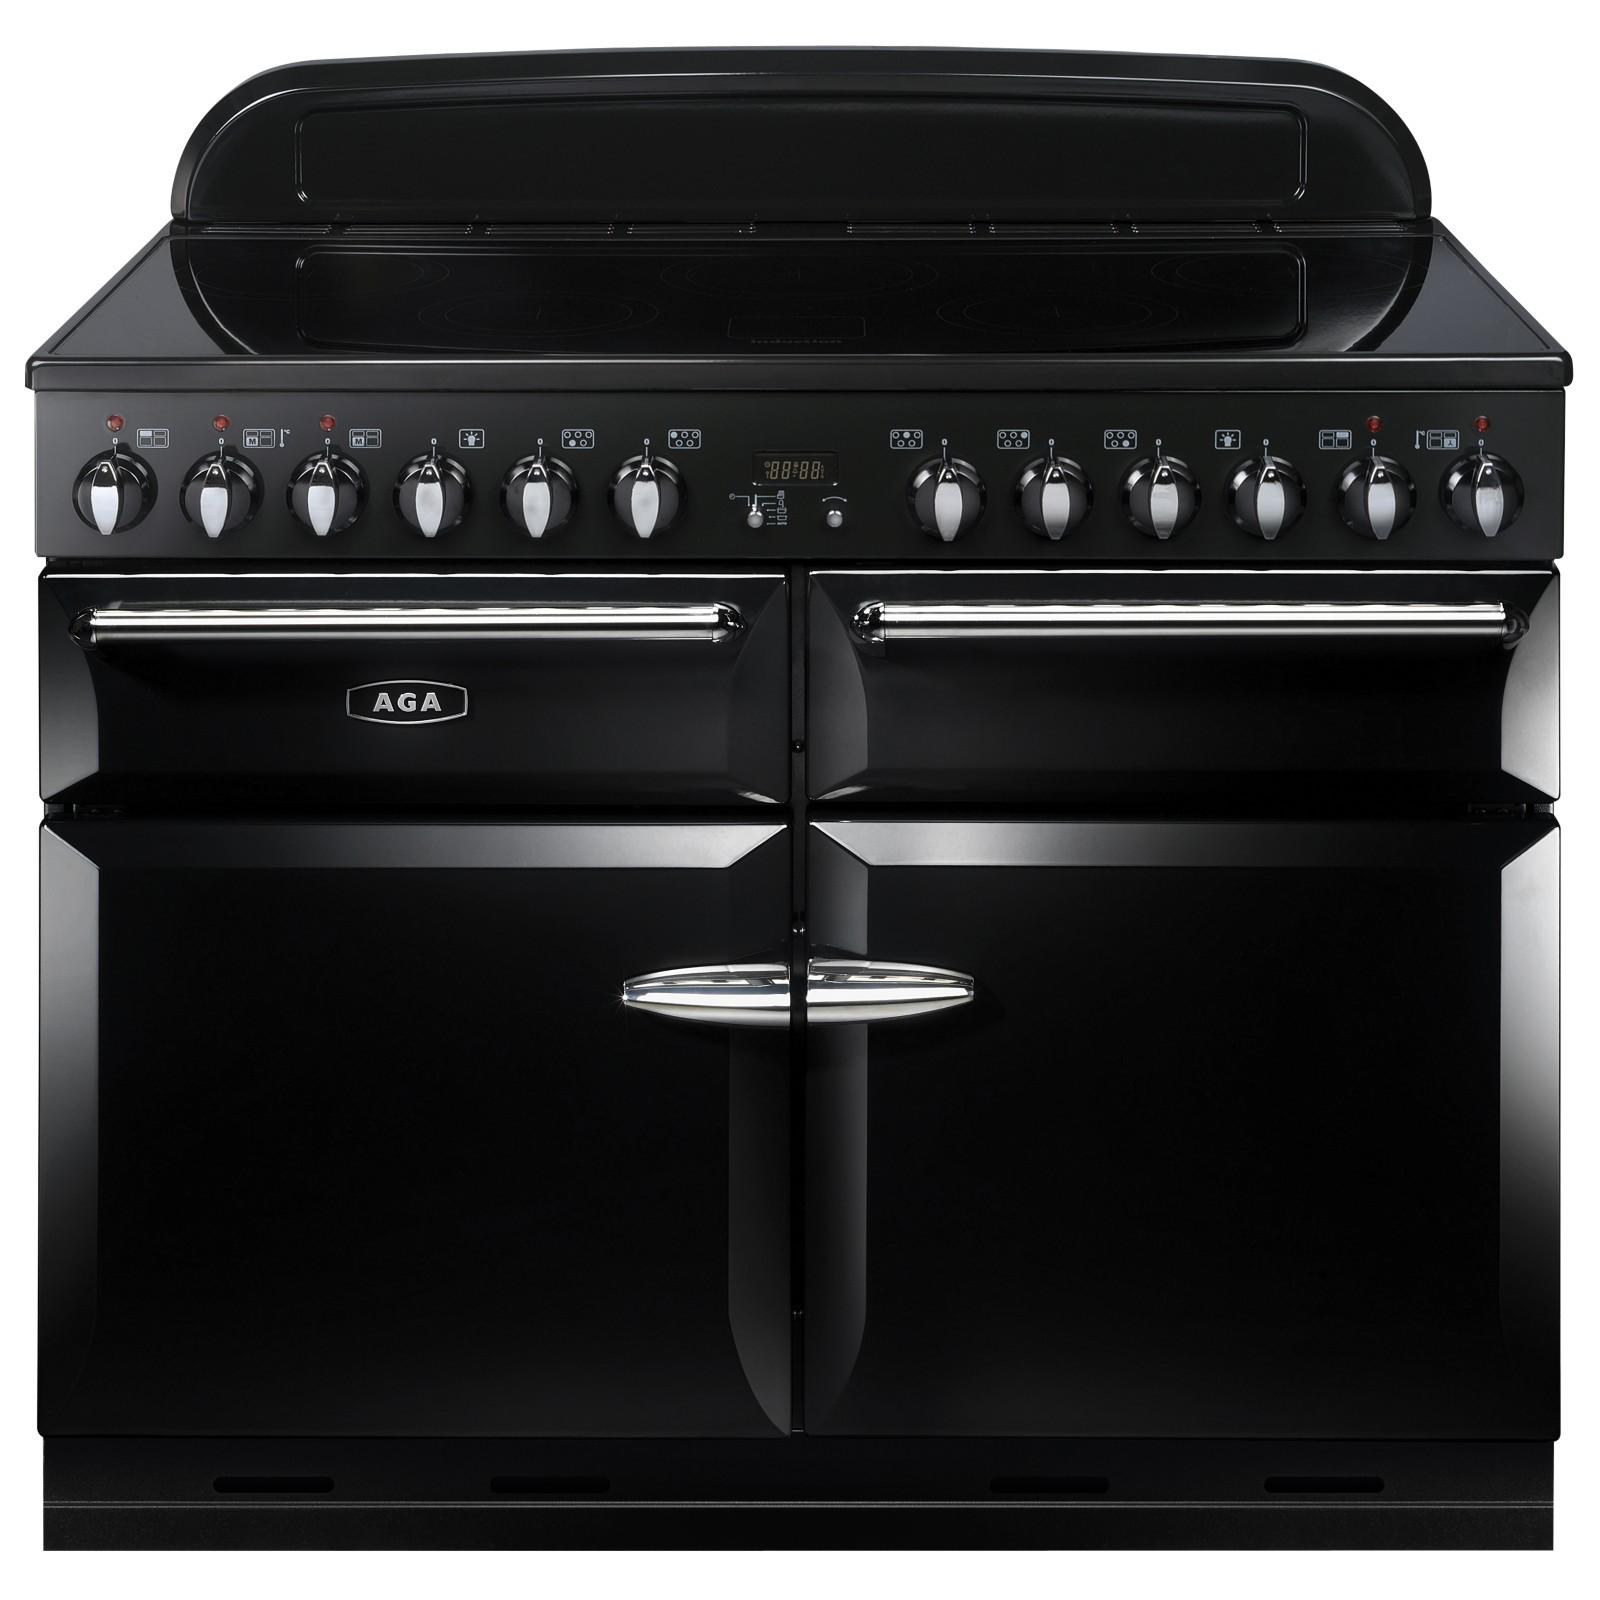 AGA Masterchef XL 110 Induction Range Cooker Gloss Black